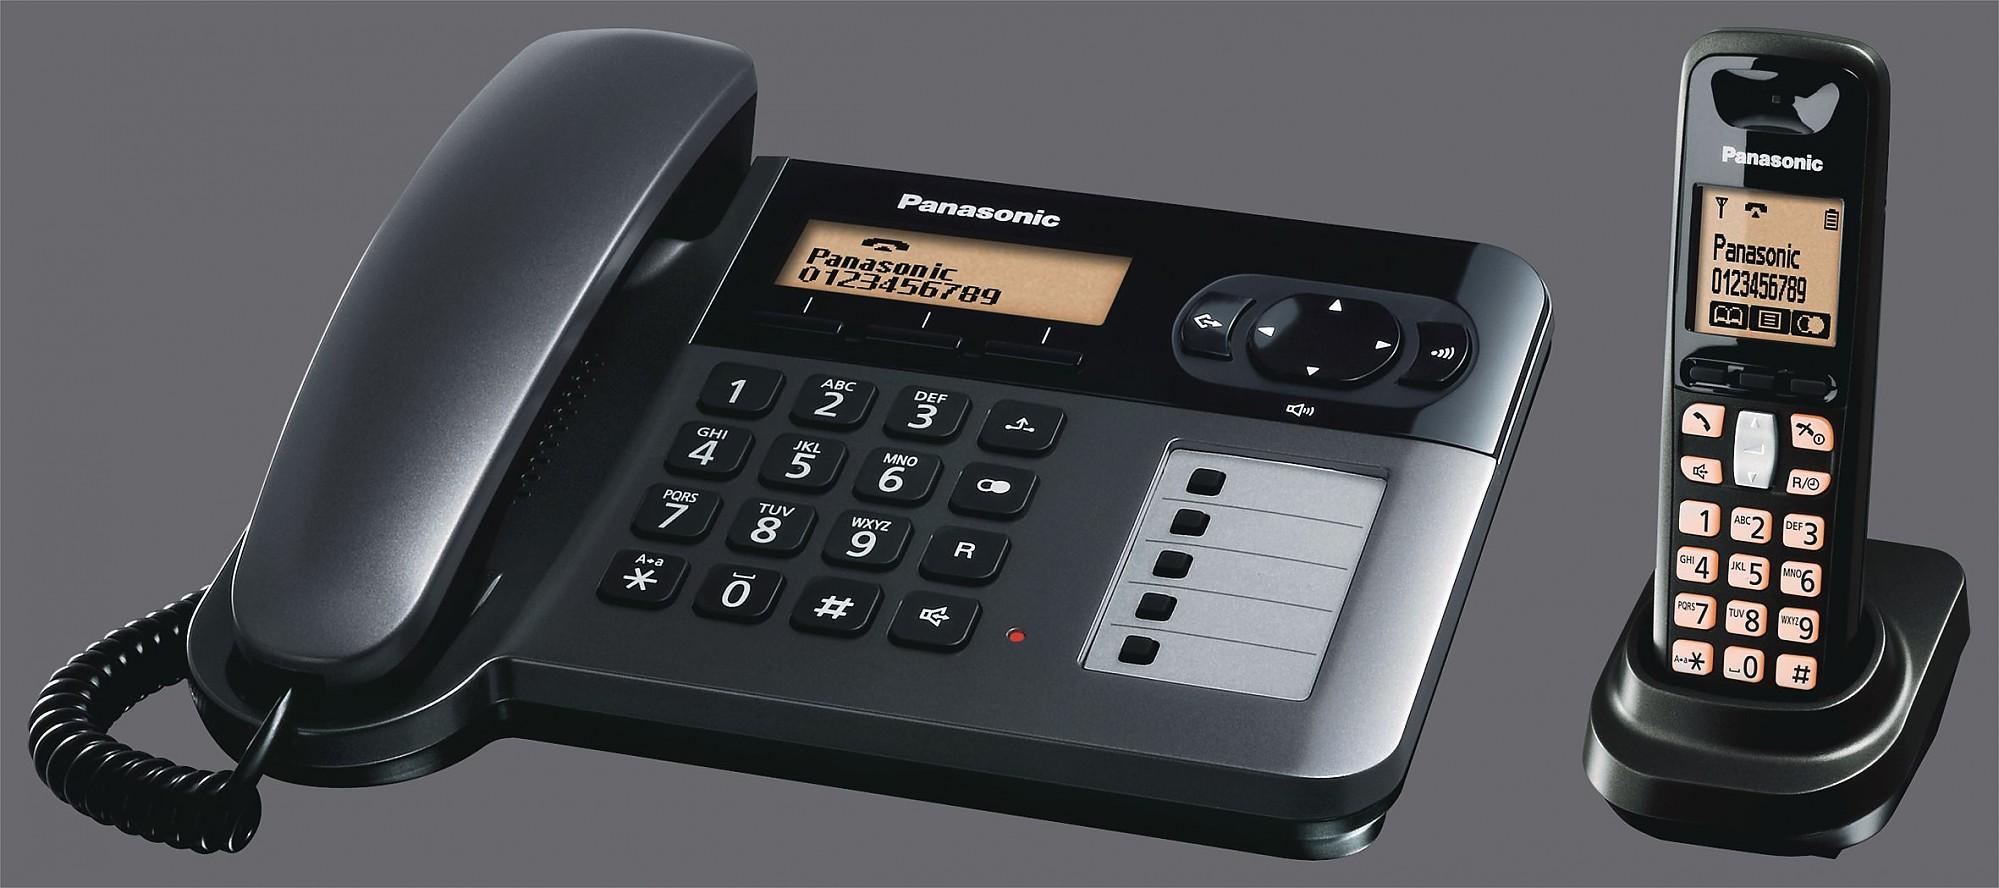 Kx tg6451gt titanio nero panasonic telekom telefoni - Telefoni a parete ...